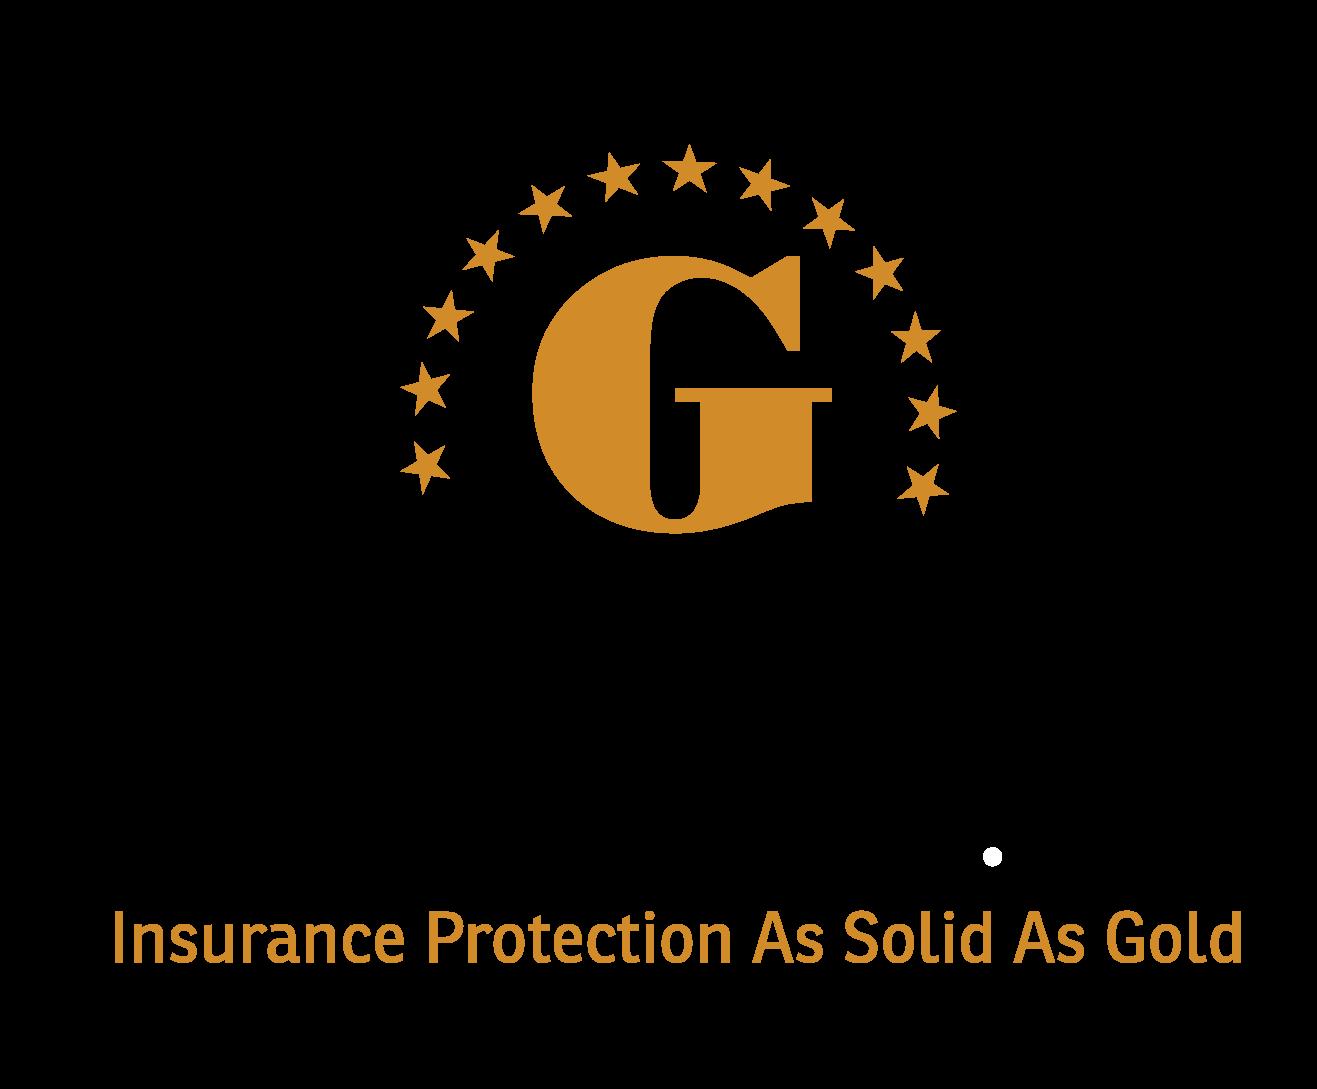 Goldstar-Company-logo